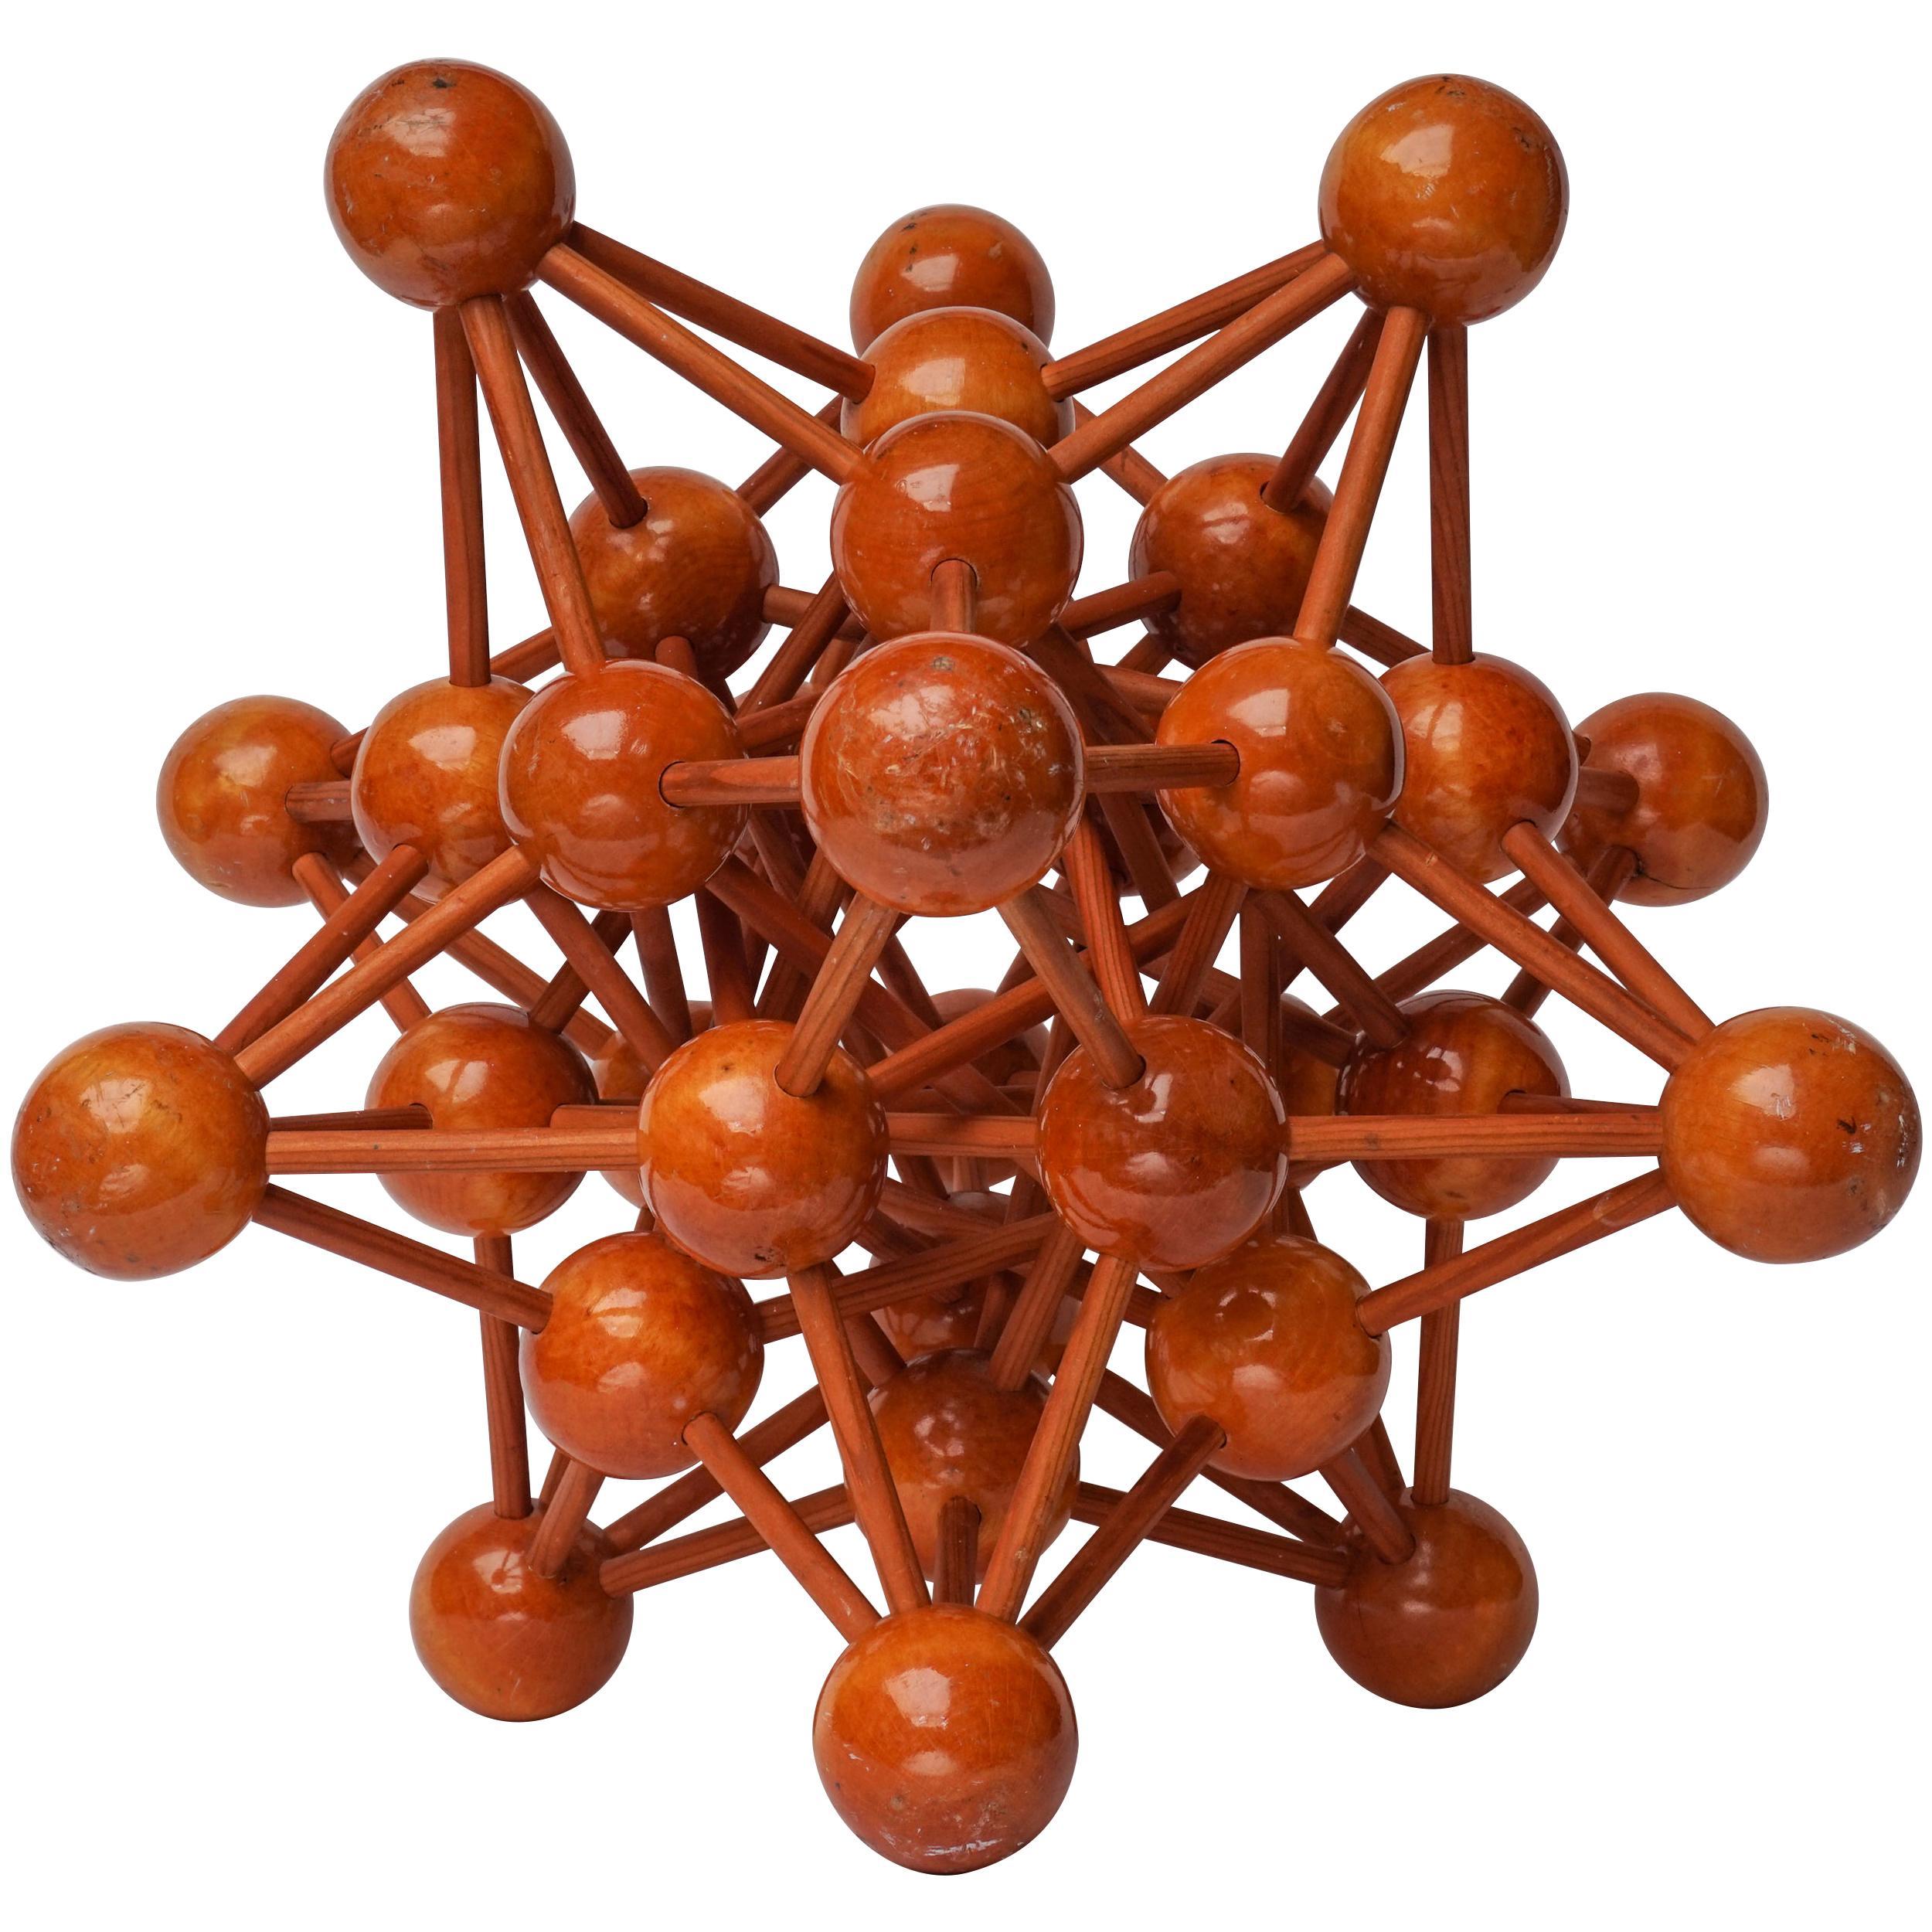 Mid-Century Modern 1950s Dutch Wooden Scientific Molecule Atomic Sculpture Model